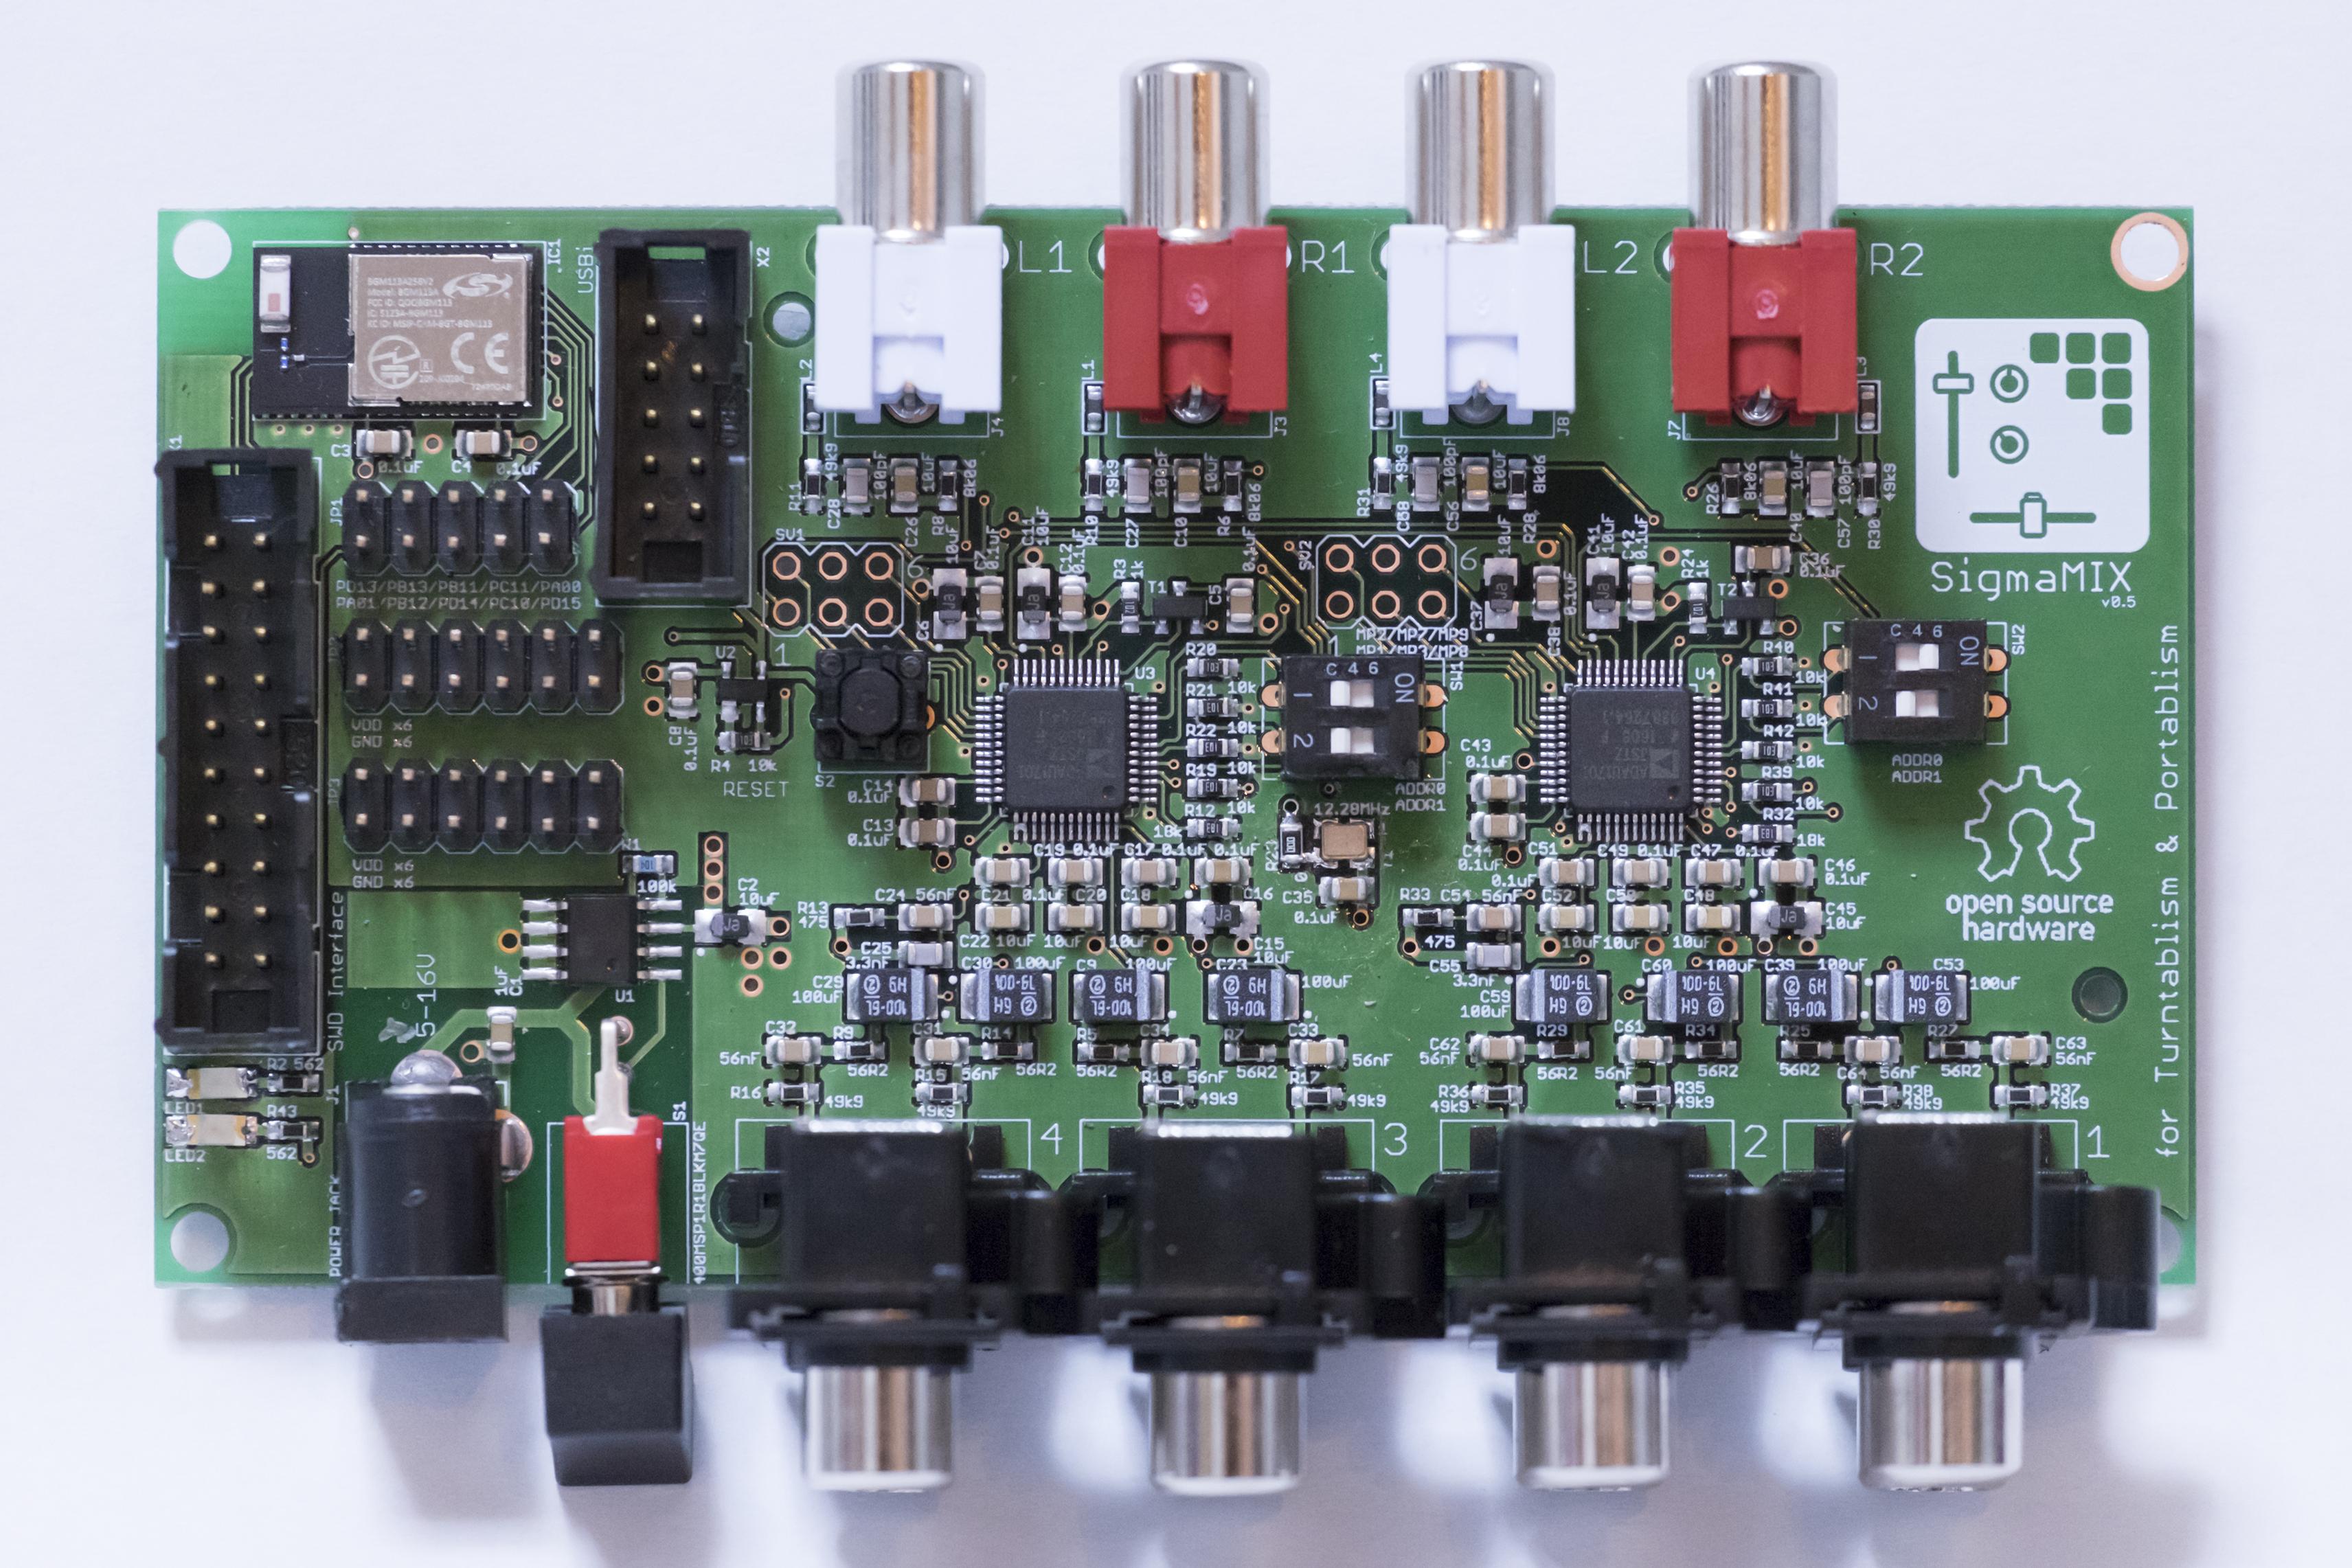 SigmaMIX PCB